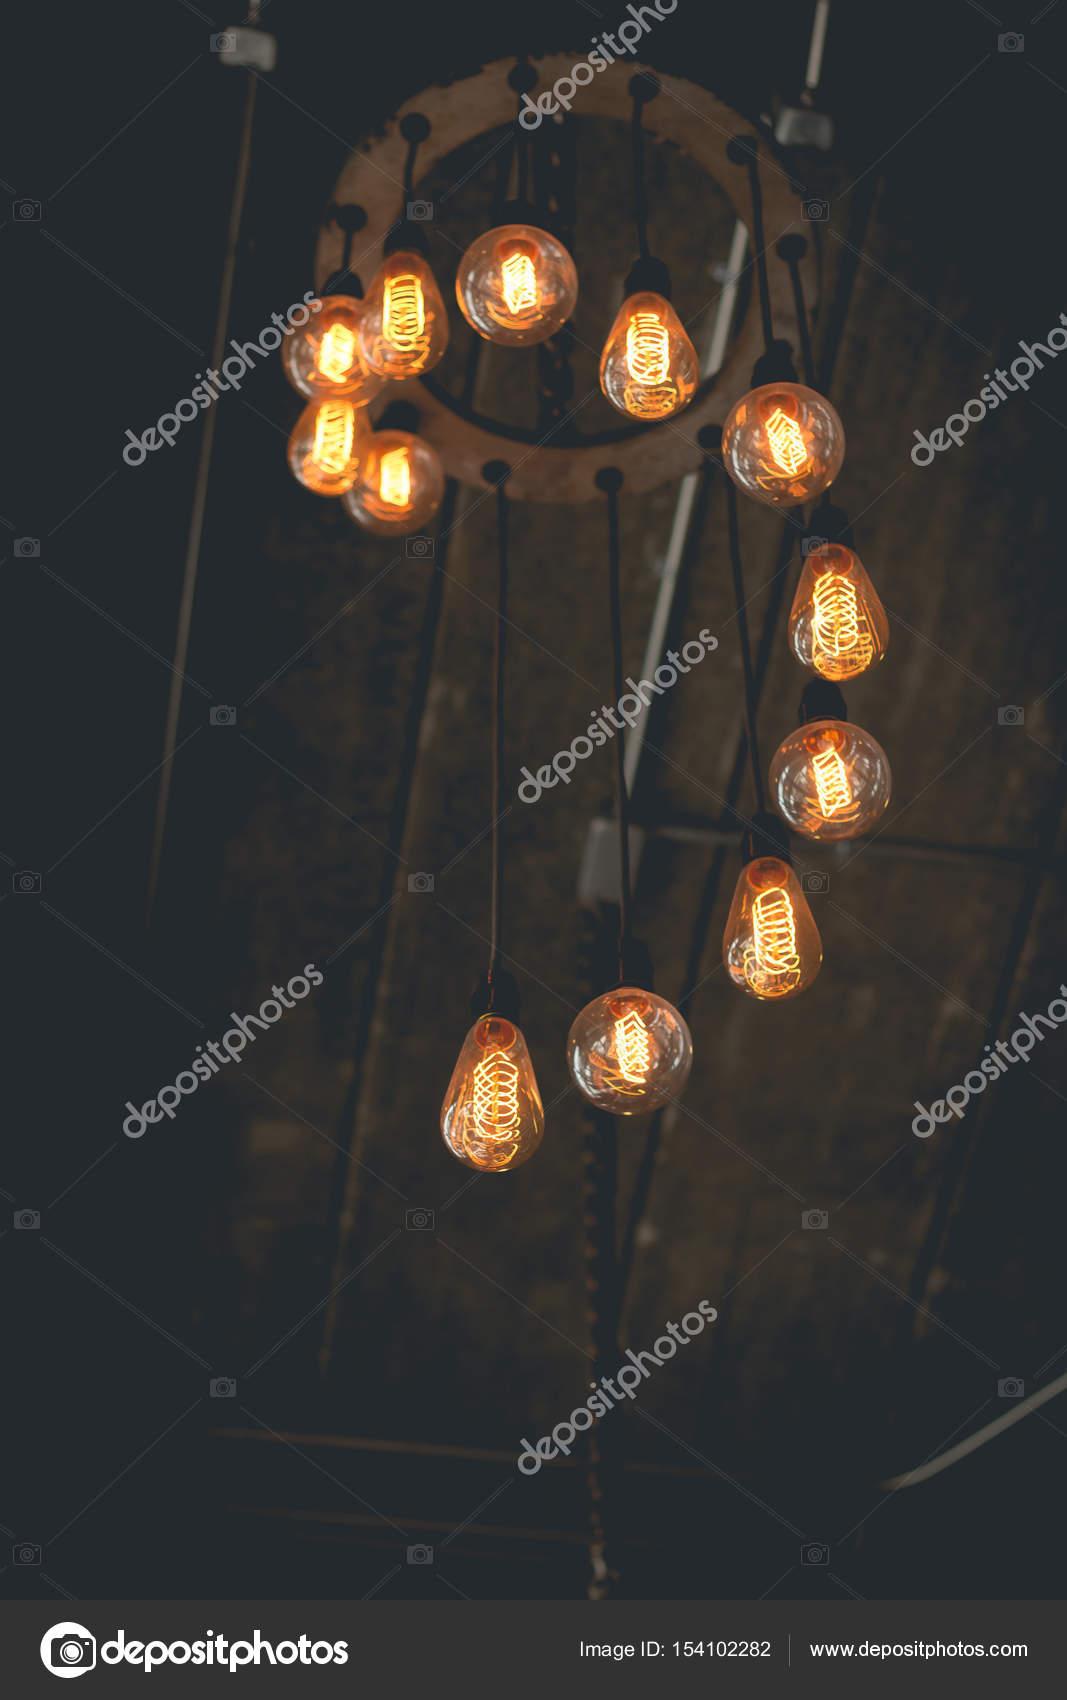 Mooie retro luxe interieur verlichting lamp decor — Stockfoto ...